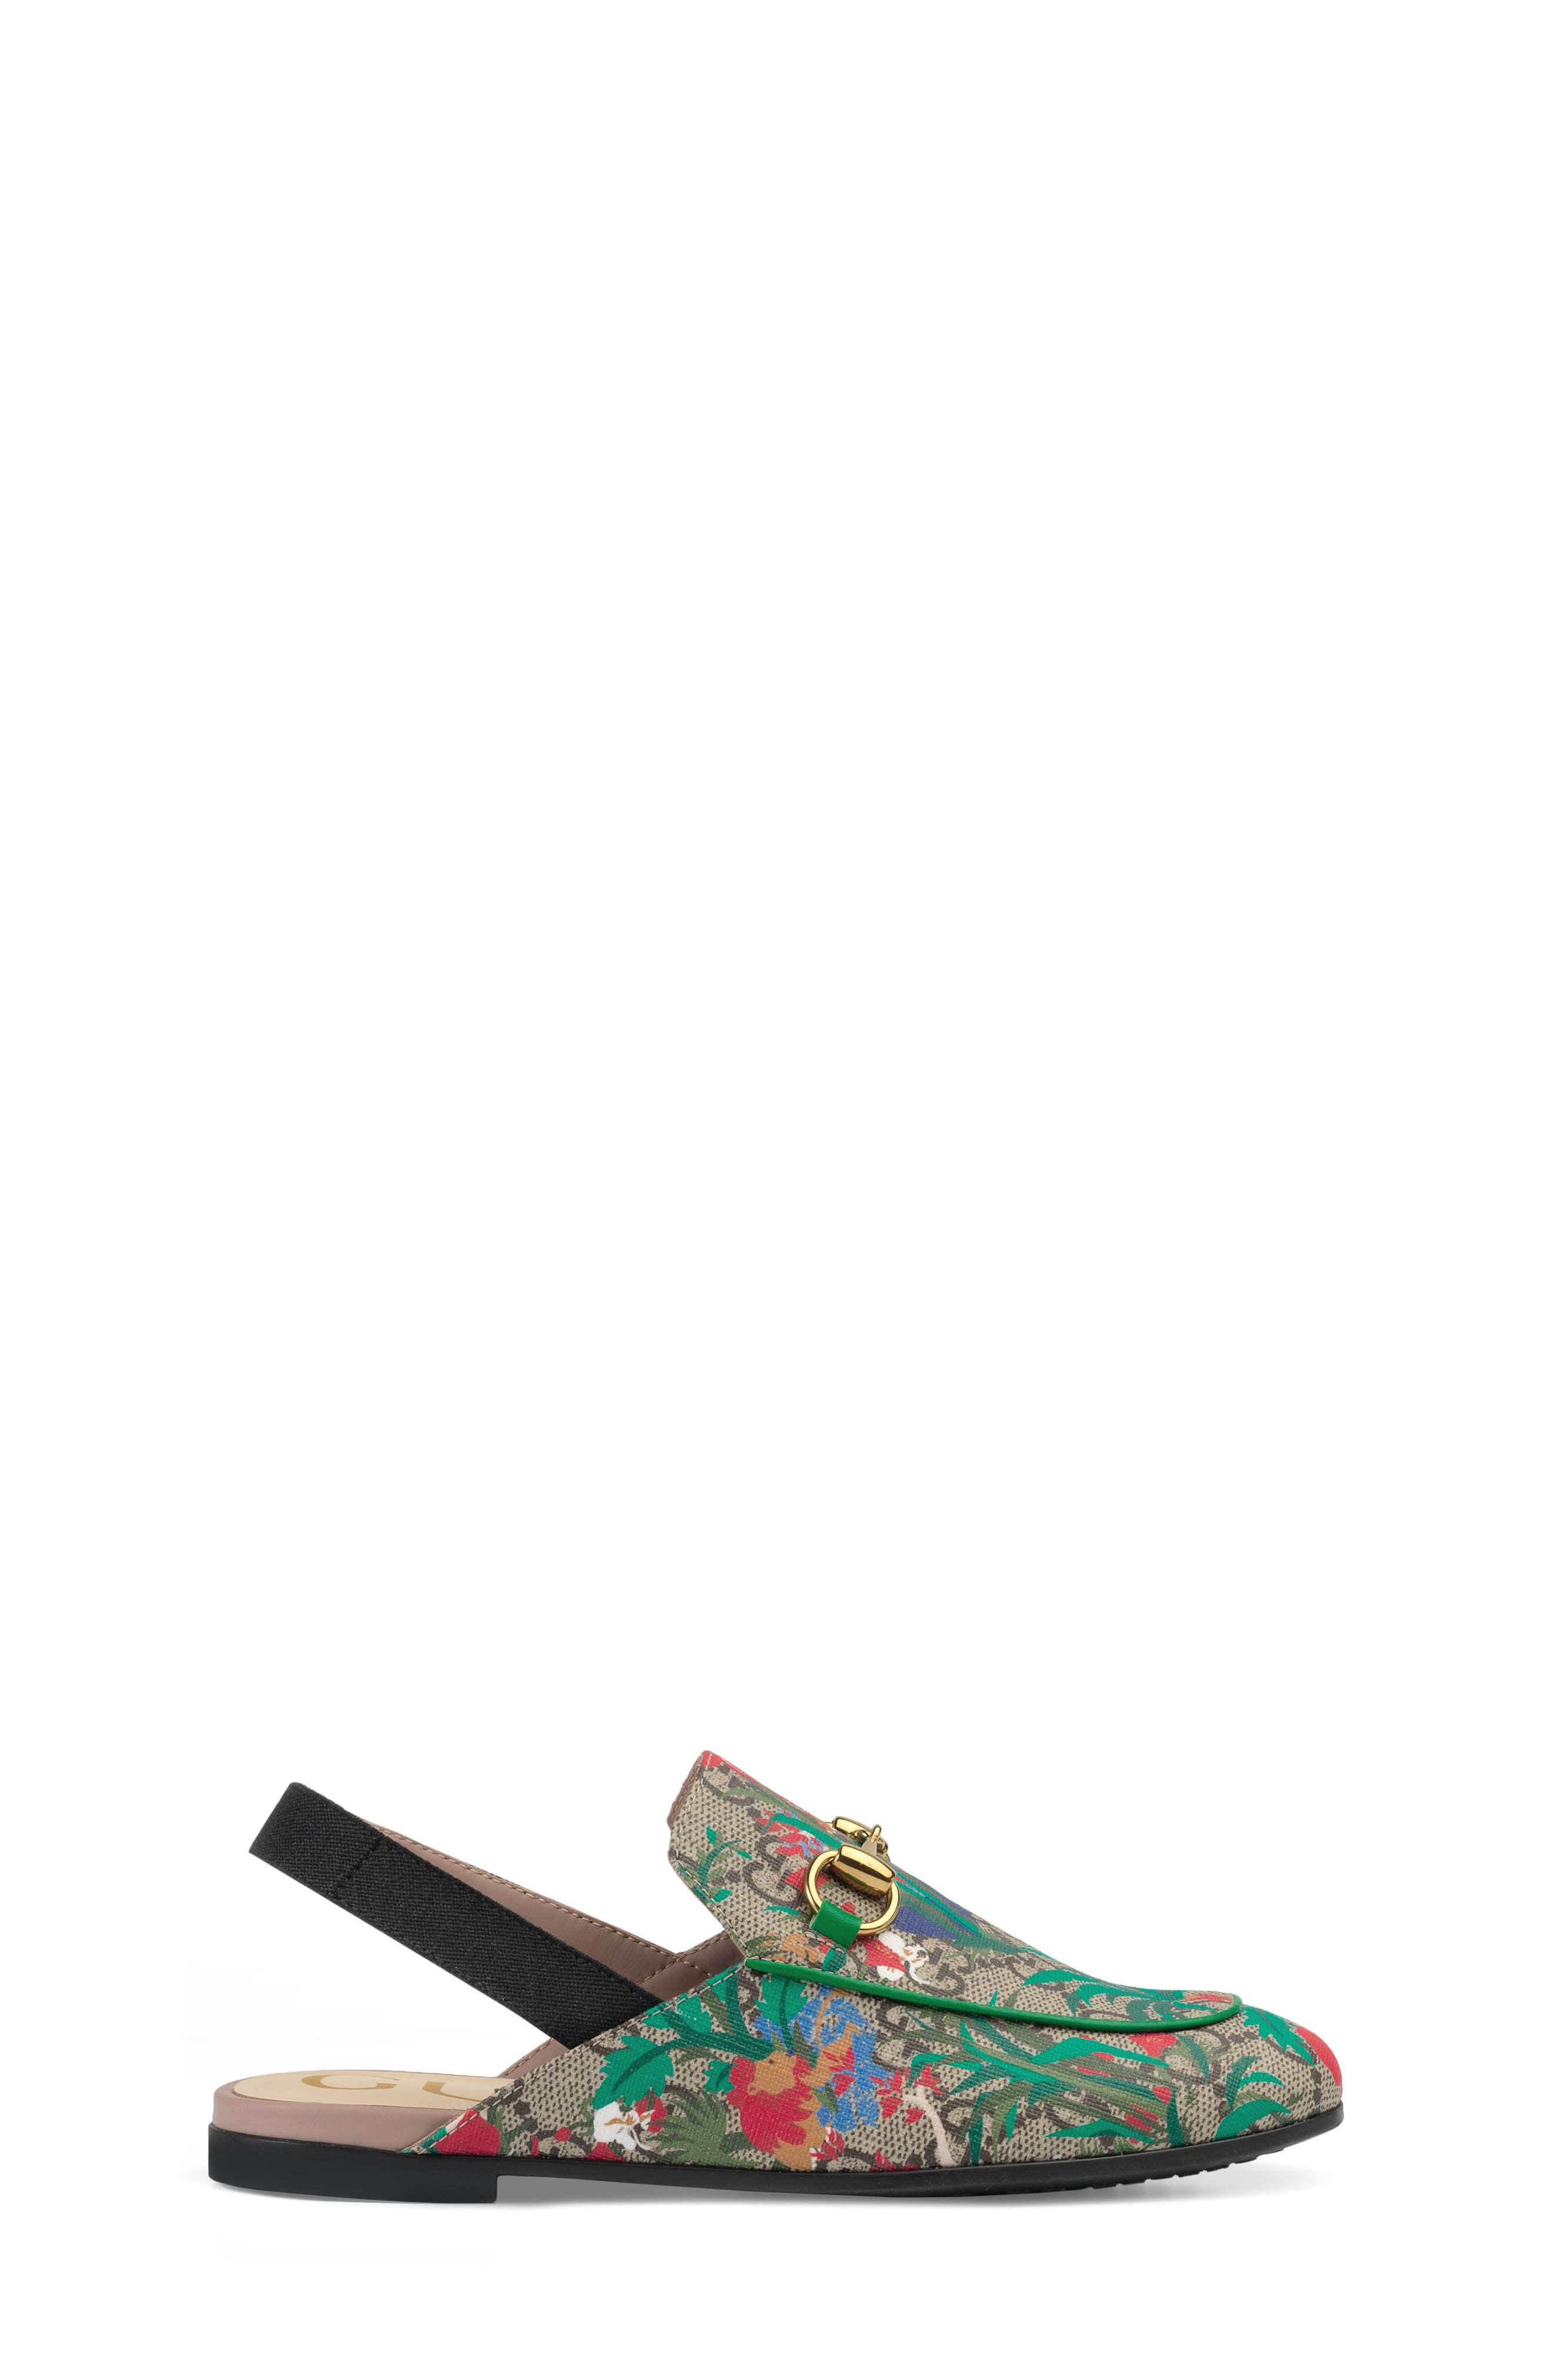 Princetown Slingback Loafer Mule,                             Alternate thumbnail 3, color,                             BEIGE EBONY MULTI